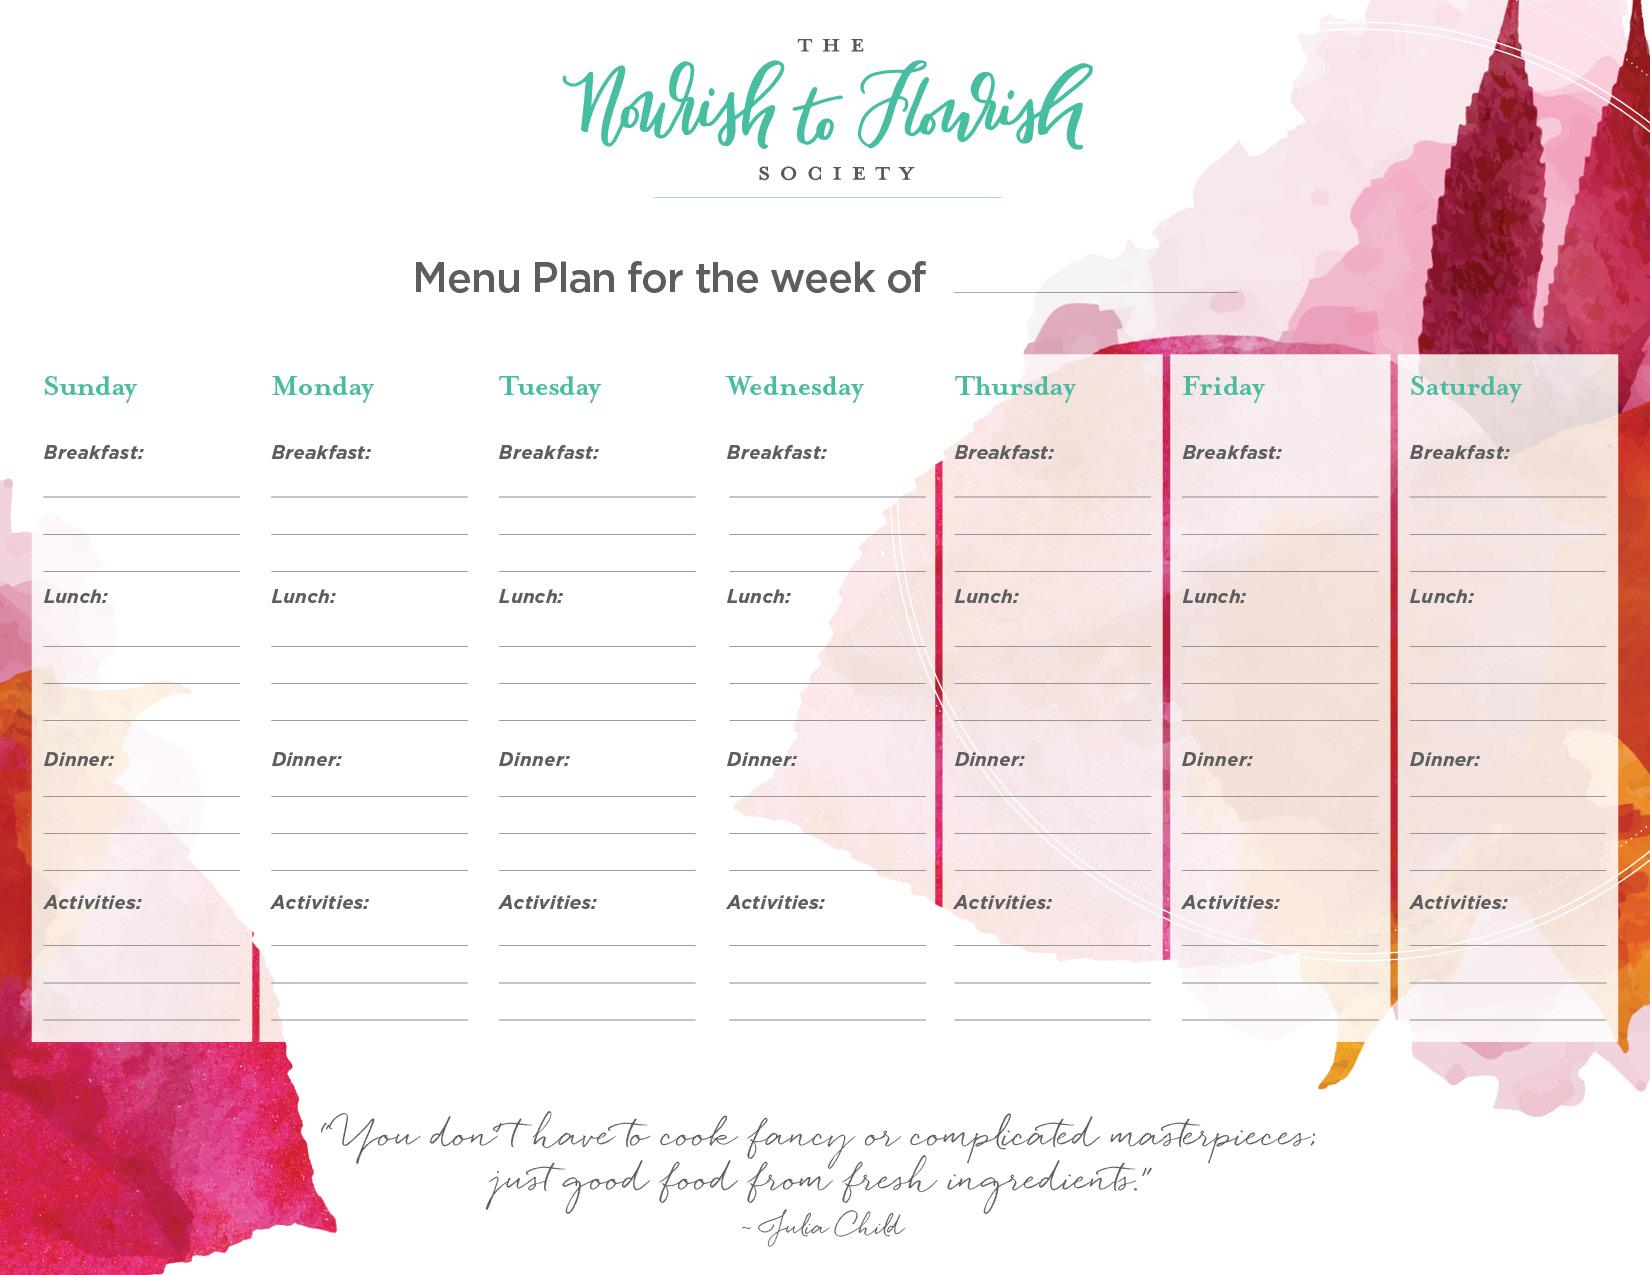 I week meal plan chart - 5-6-18.jpg